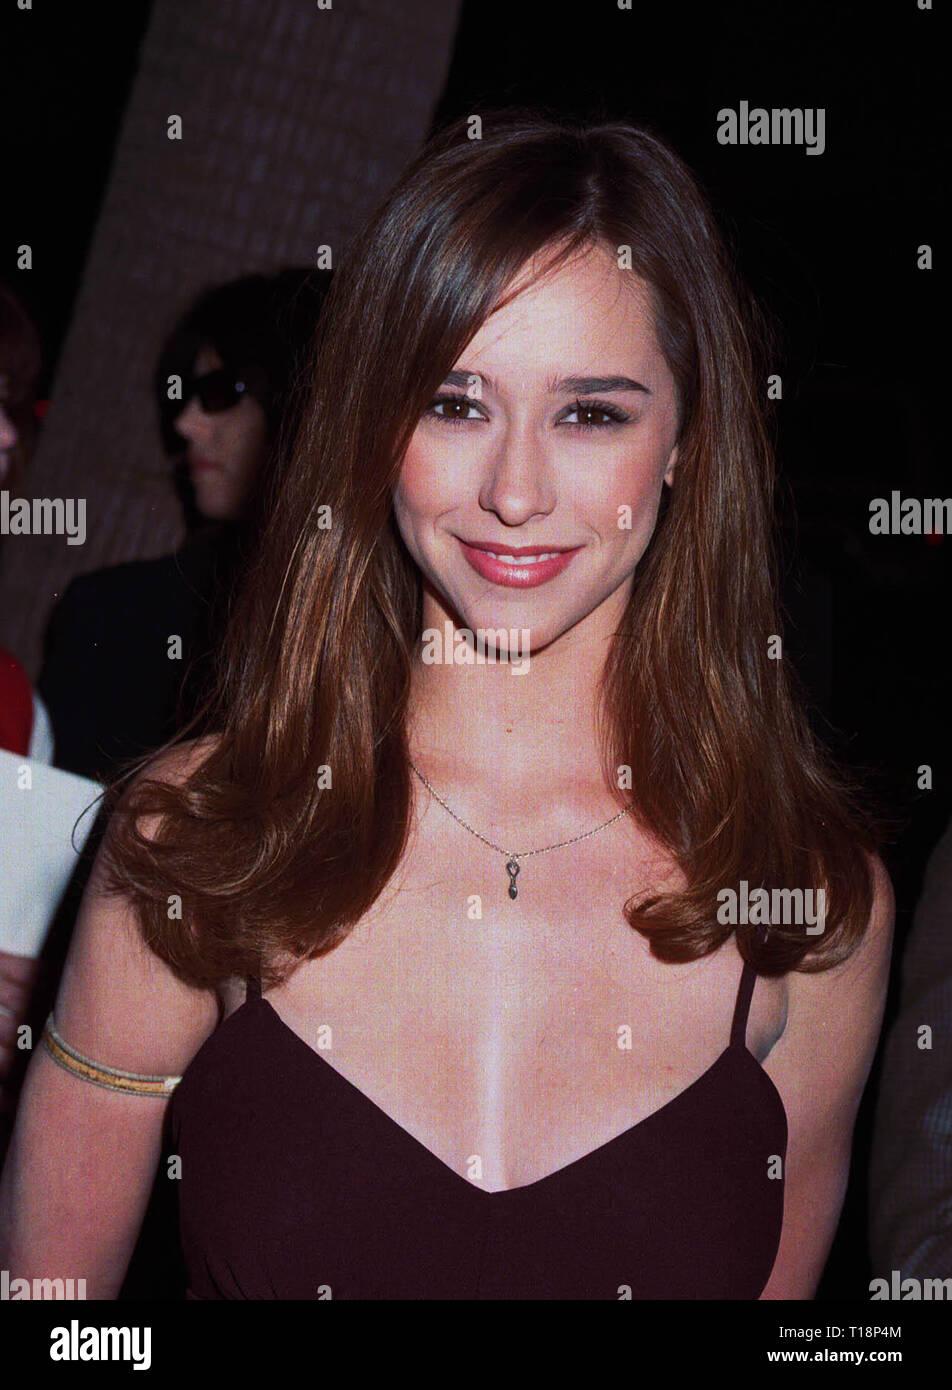 los-angeles-ca-september-23-1997-actress